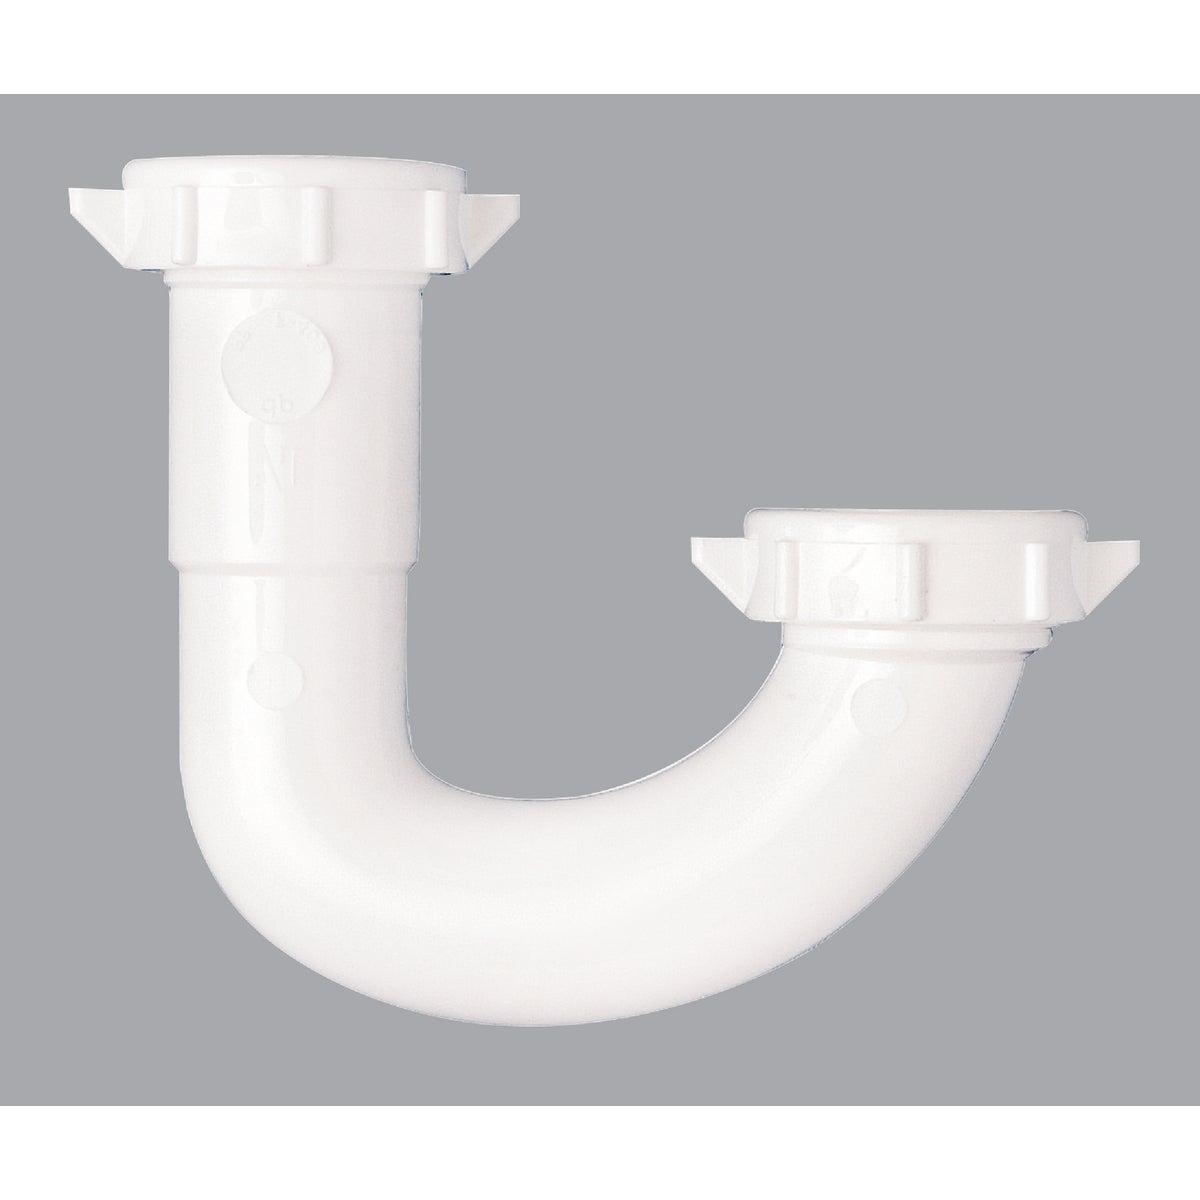 Plumb Pak/Keeney Mfg. 1-1/2 WHT PLASTIC J-BEND 403799